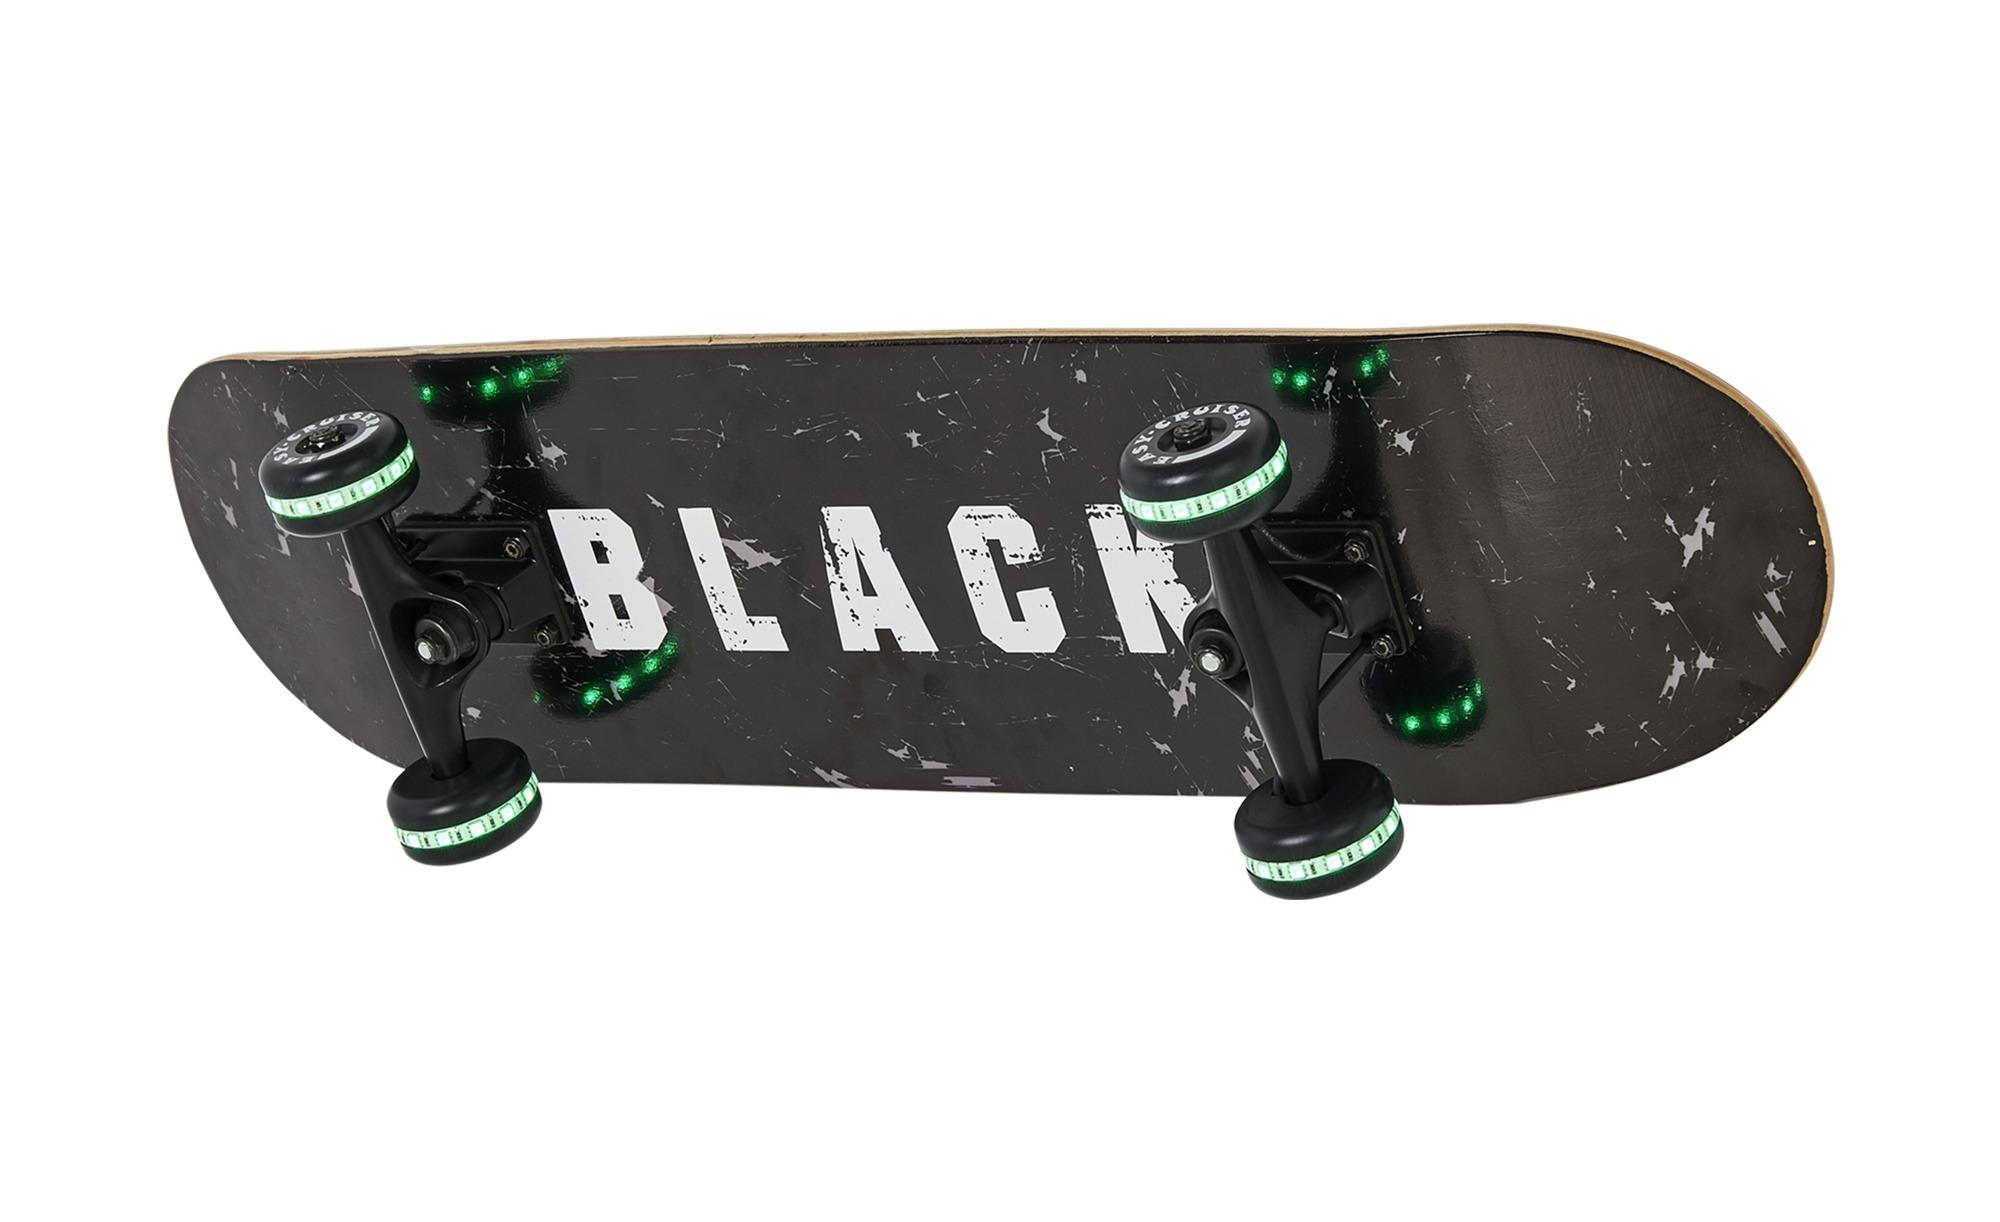 LED-Wandleuchte  Skateboard ¦ schwarz ¦ Maße (cm): B: 20,2 H: 19 Lampen & Leuchten > Innenleuchten > Kinderlampen - Höffner